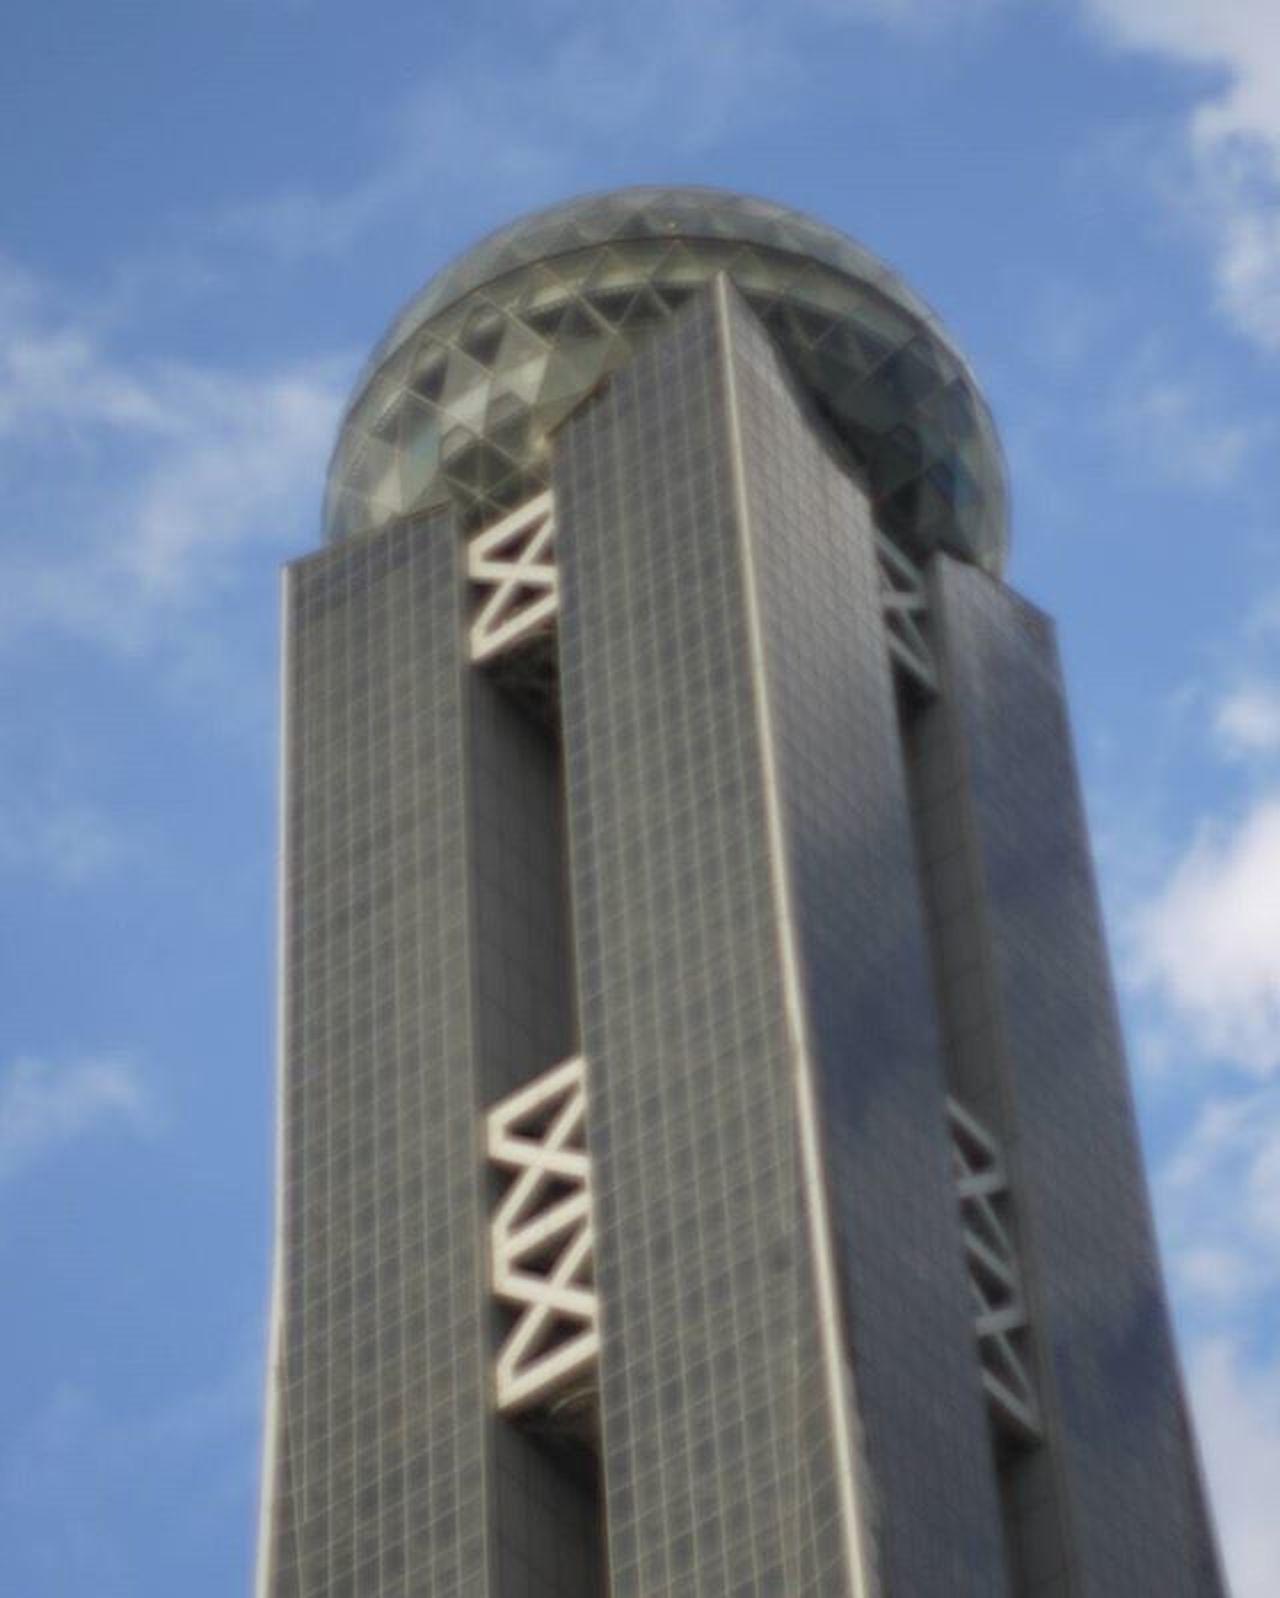 Oldlens GF2 Lumix Panasonic  Pentax Pentaxlens 50mmf2 Lumixgf2 下関 海峡ゆめタワー ゆめタワー イマソラ イマソラ部 今空 Kaikyouyumetower Bluesky Tower Sky ルミックスgf2 ルミックス オールドレンズ オールドレンズ部 カメラ好きな人と繋がりたい 写真好きな人と繋がりたい ファインダー越しの私の世界 ミラーレス カメラ好き ペンタックス ペンタックスレンズ